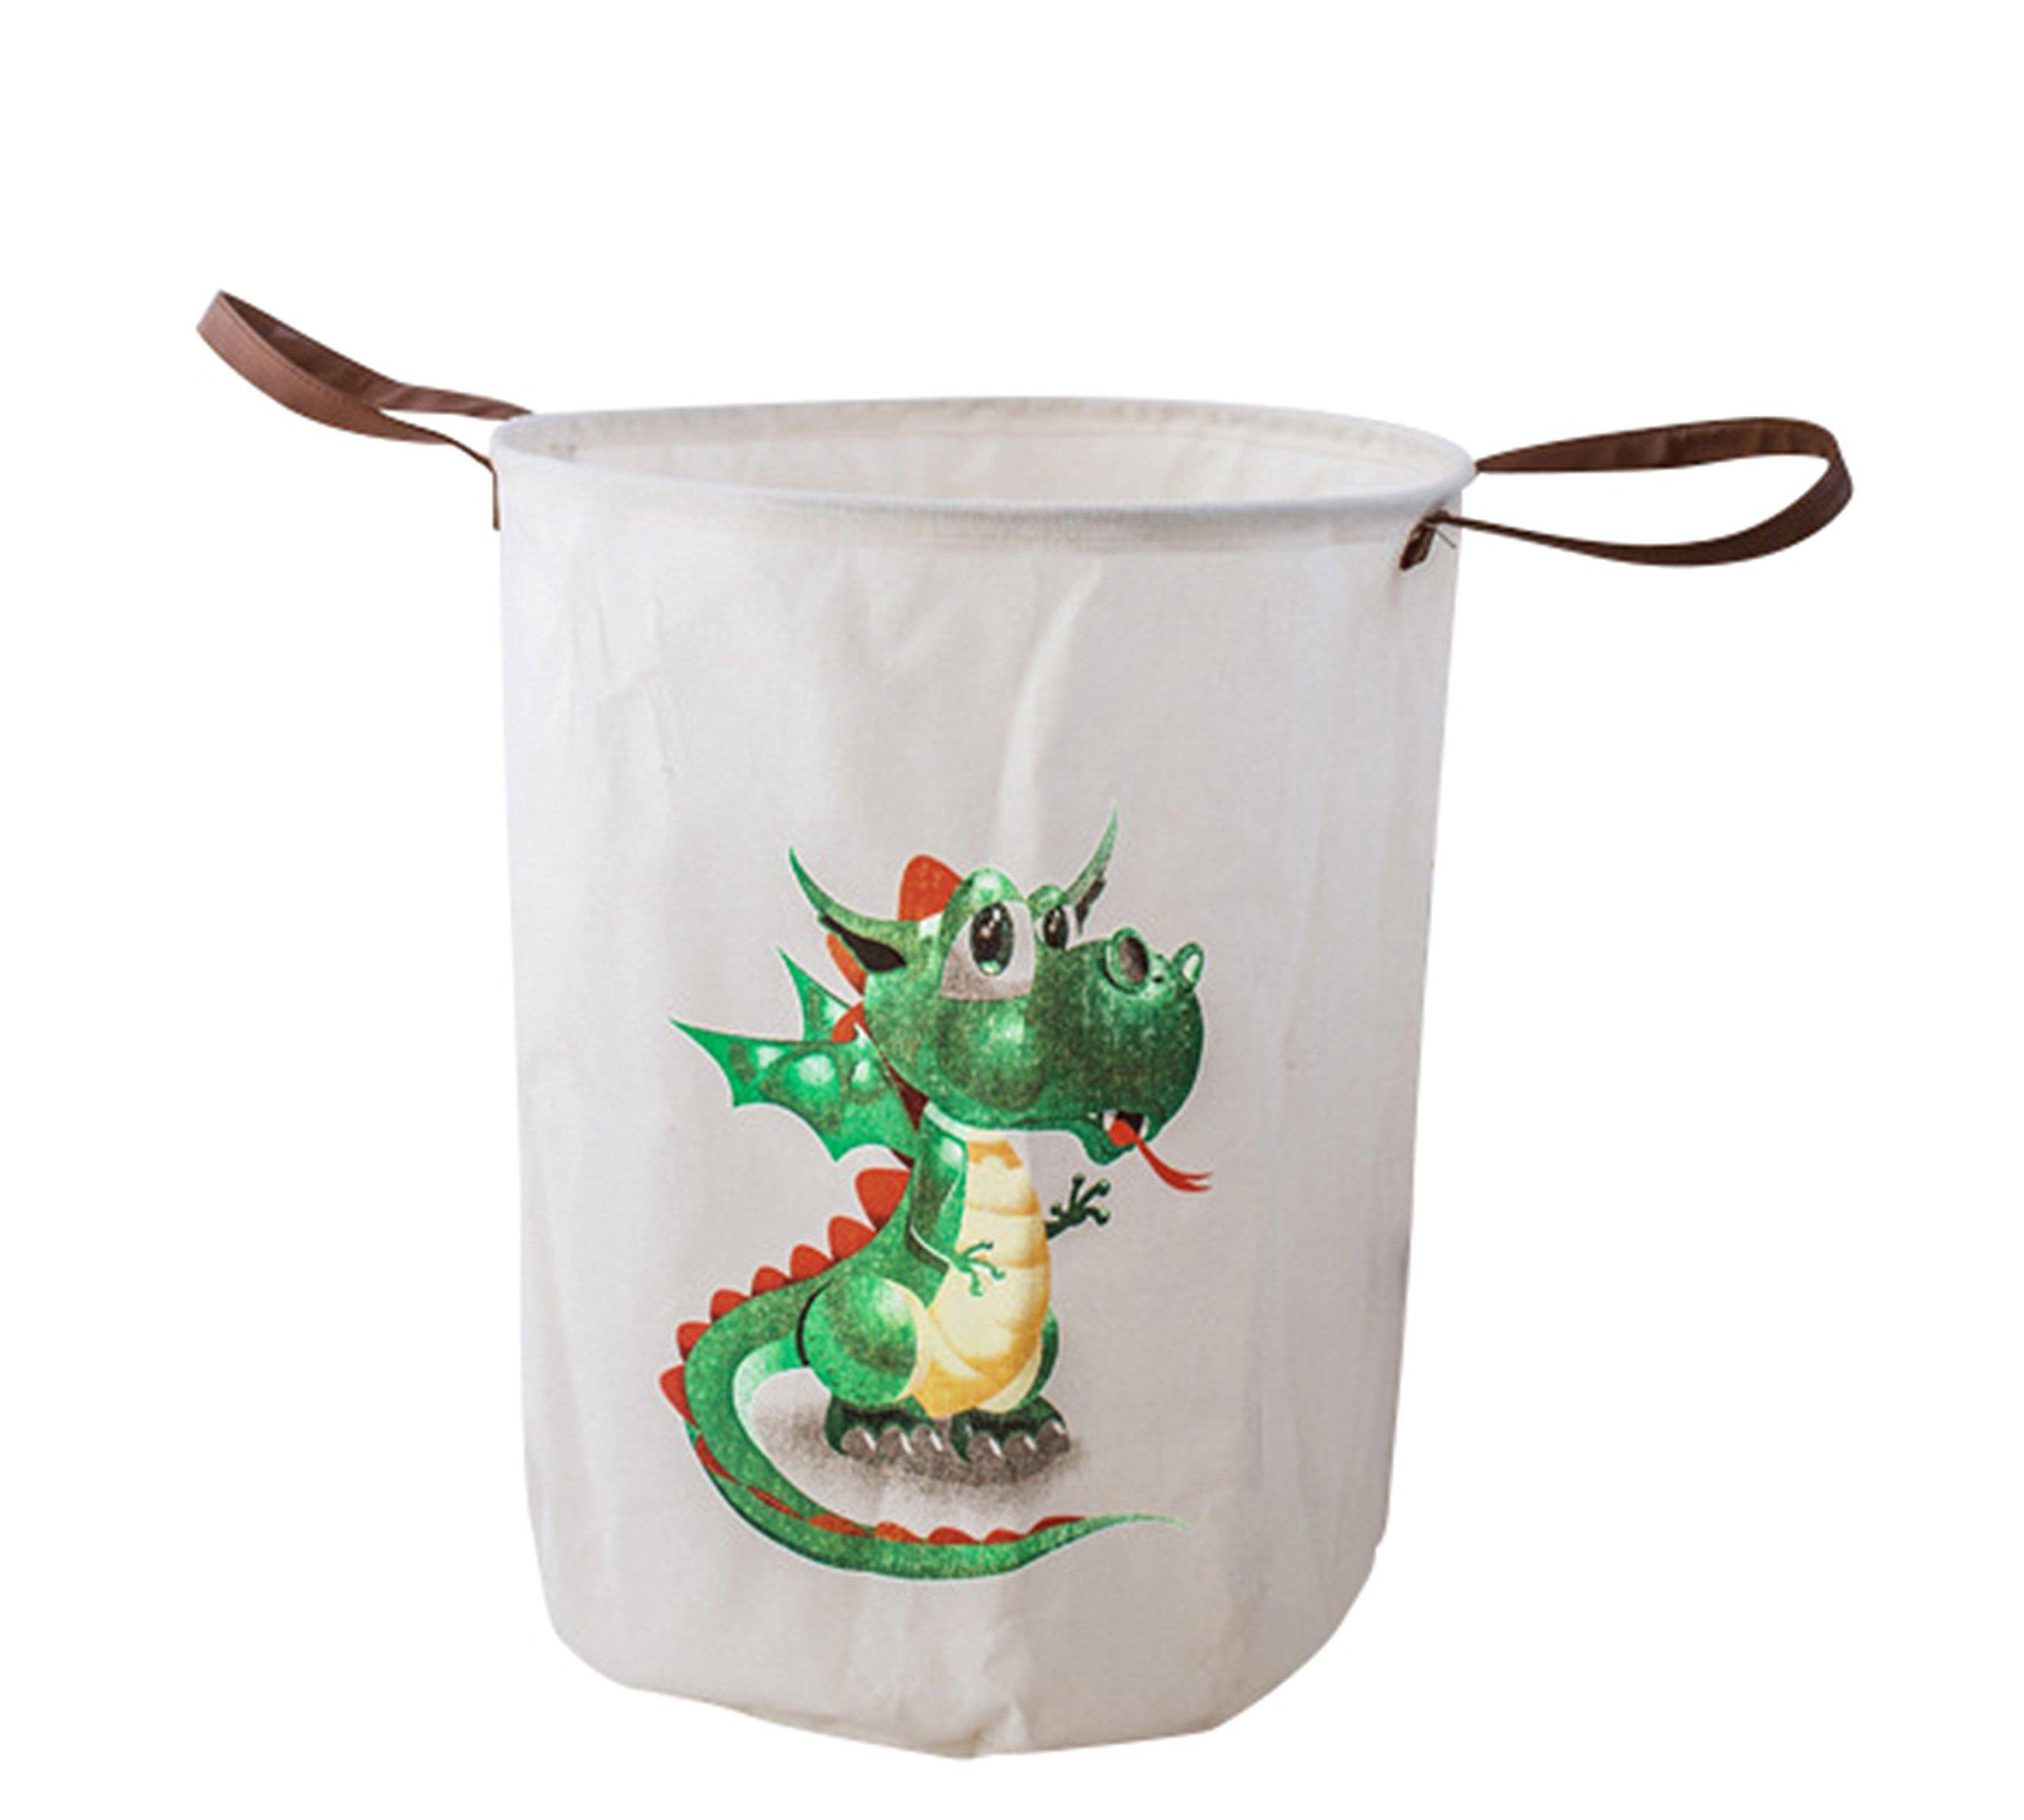 LEELI Laundry Hamper with Handles-Collapsible Canvas Basket for Storage Bin,Kids Room,Home Organizer,Nursery Storage,Baby Hamper,19.7×15.7(Green Dragon)